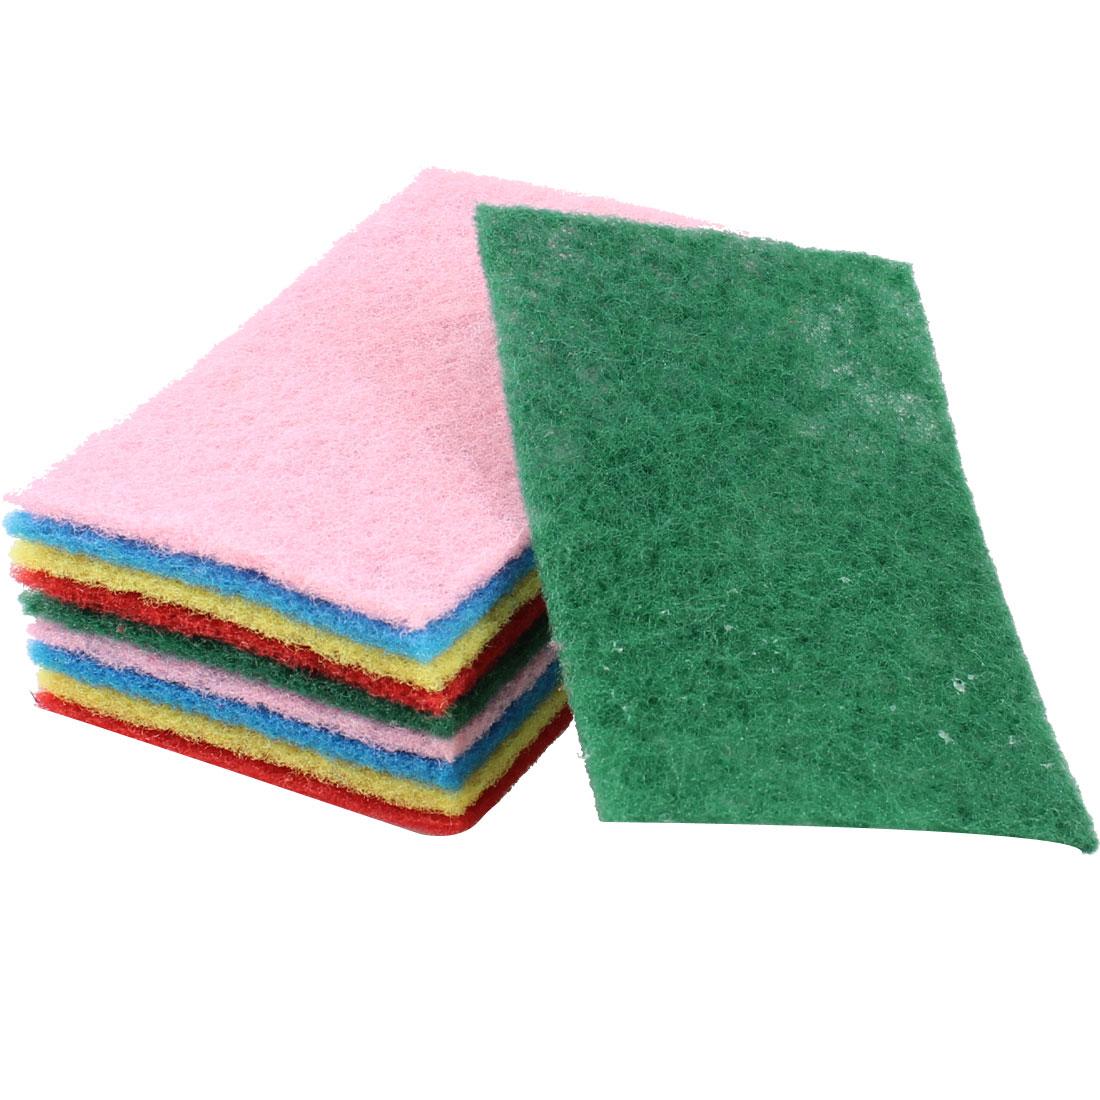 10 Pcs Colors Kitchen Rectangle Sponge Bowl Dish Scrub Cleaning Pad